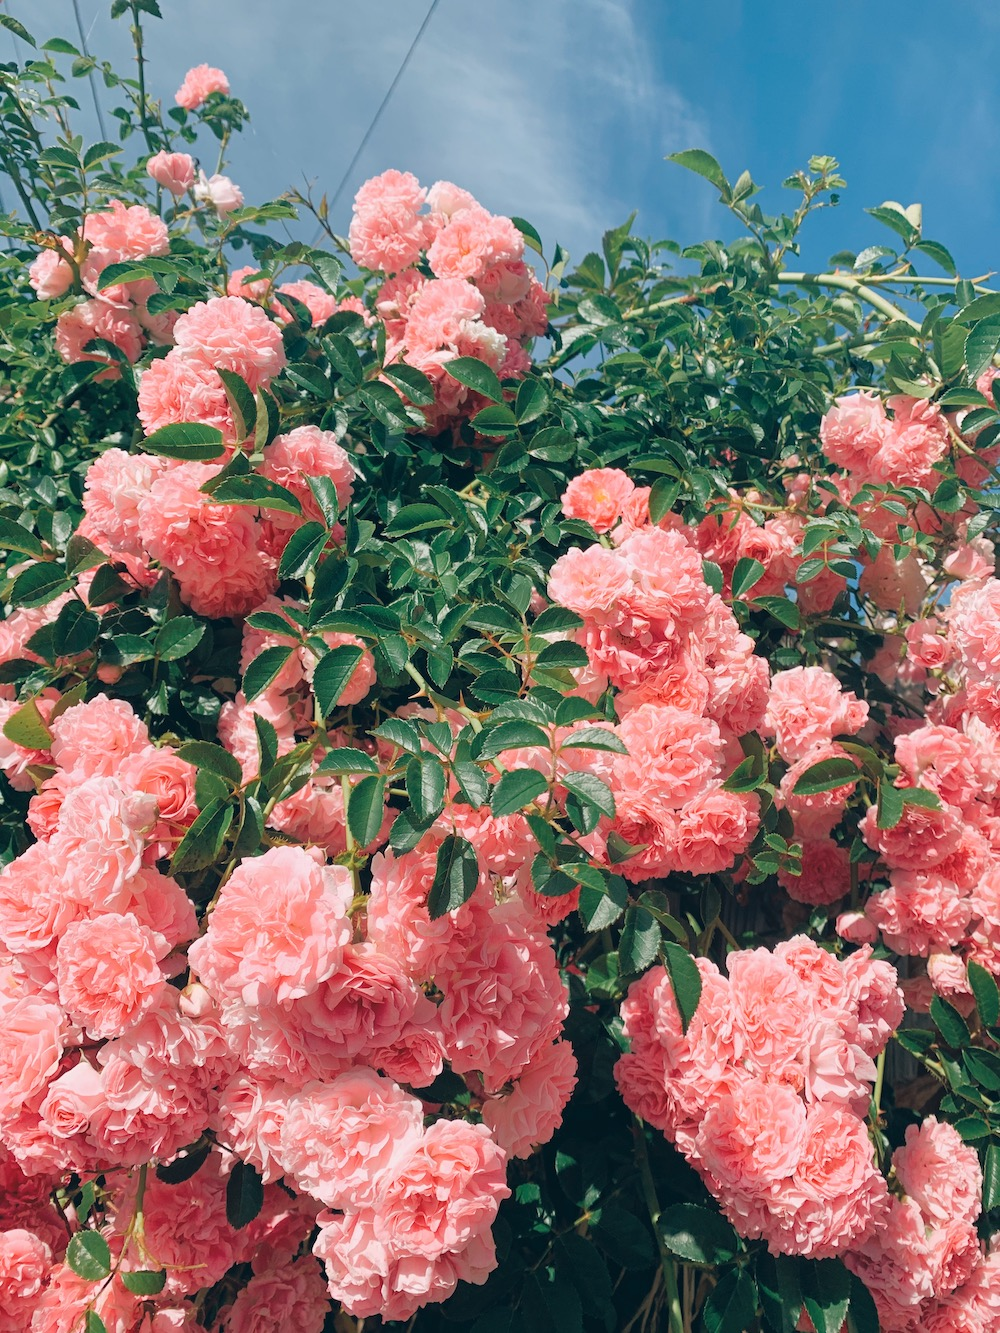 【VSCO】可愛い薔薇を見つけました♡_1